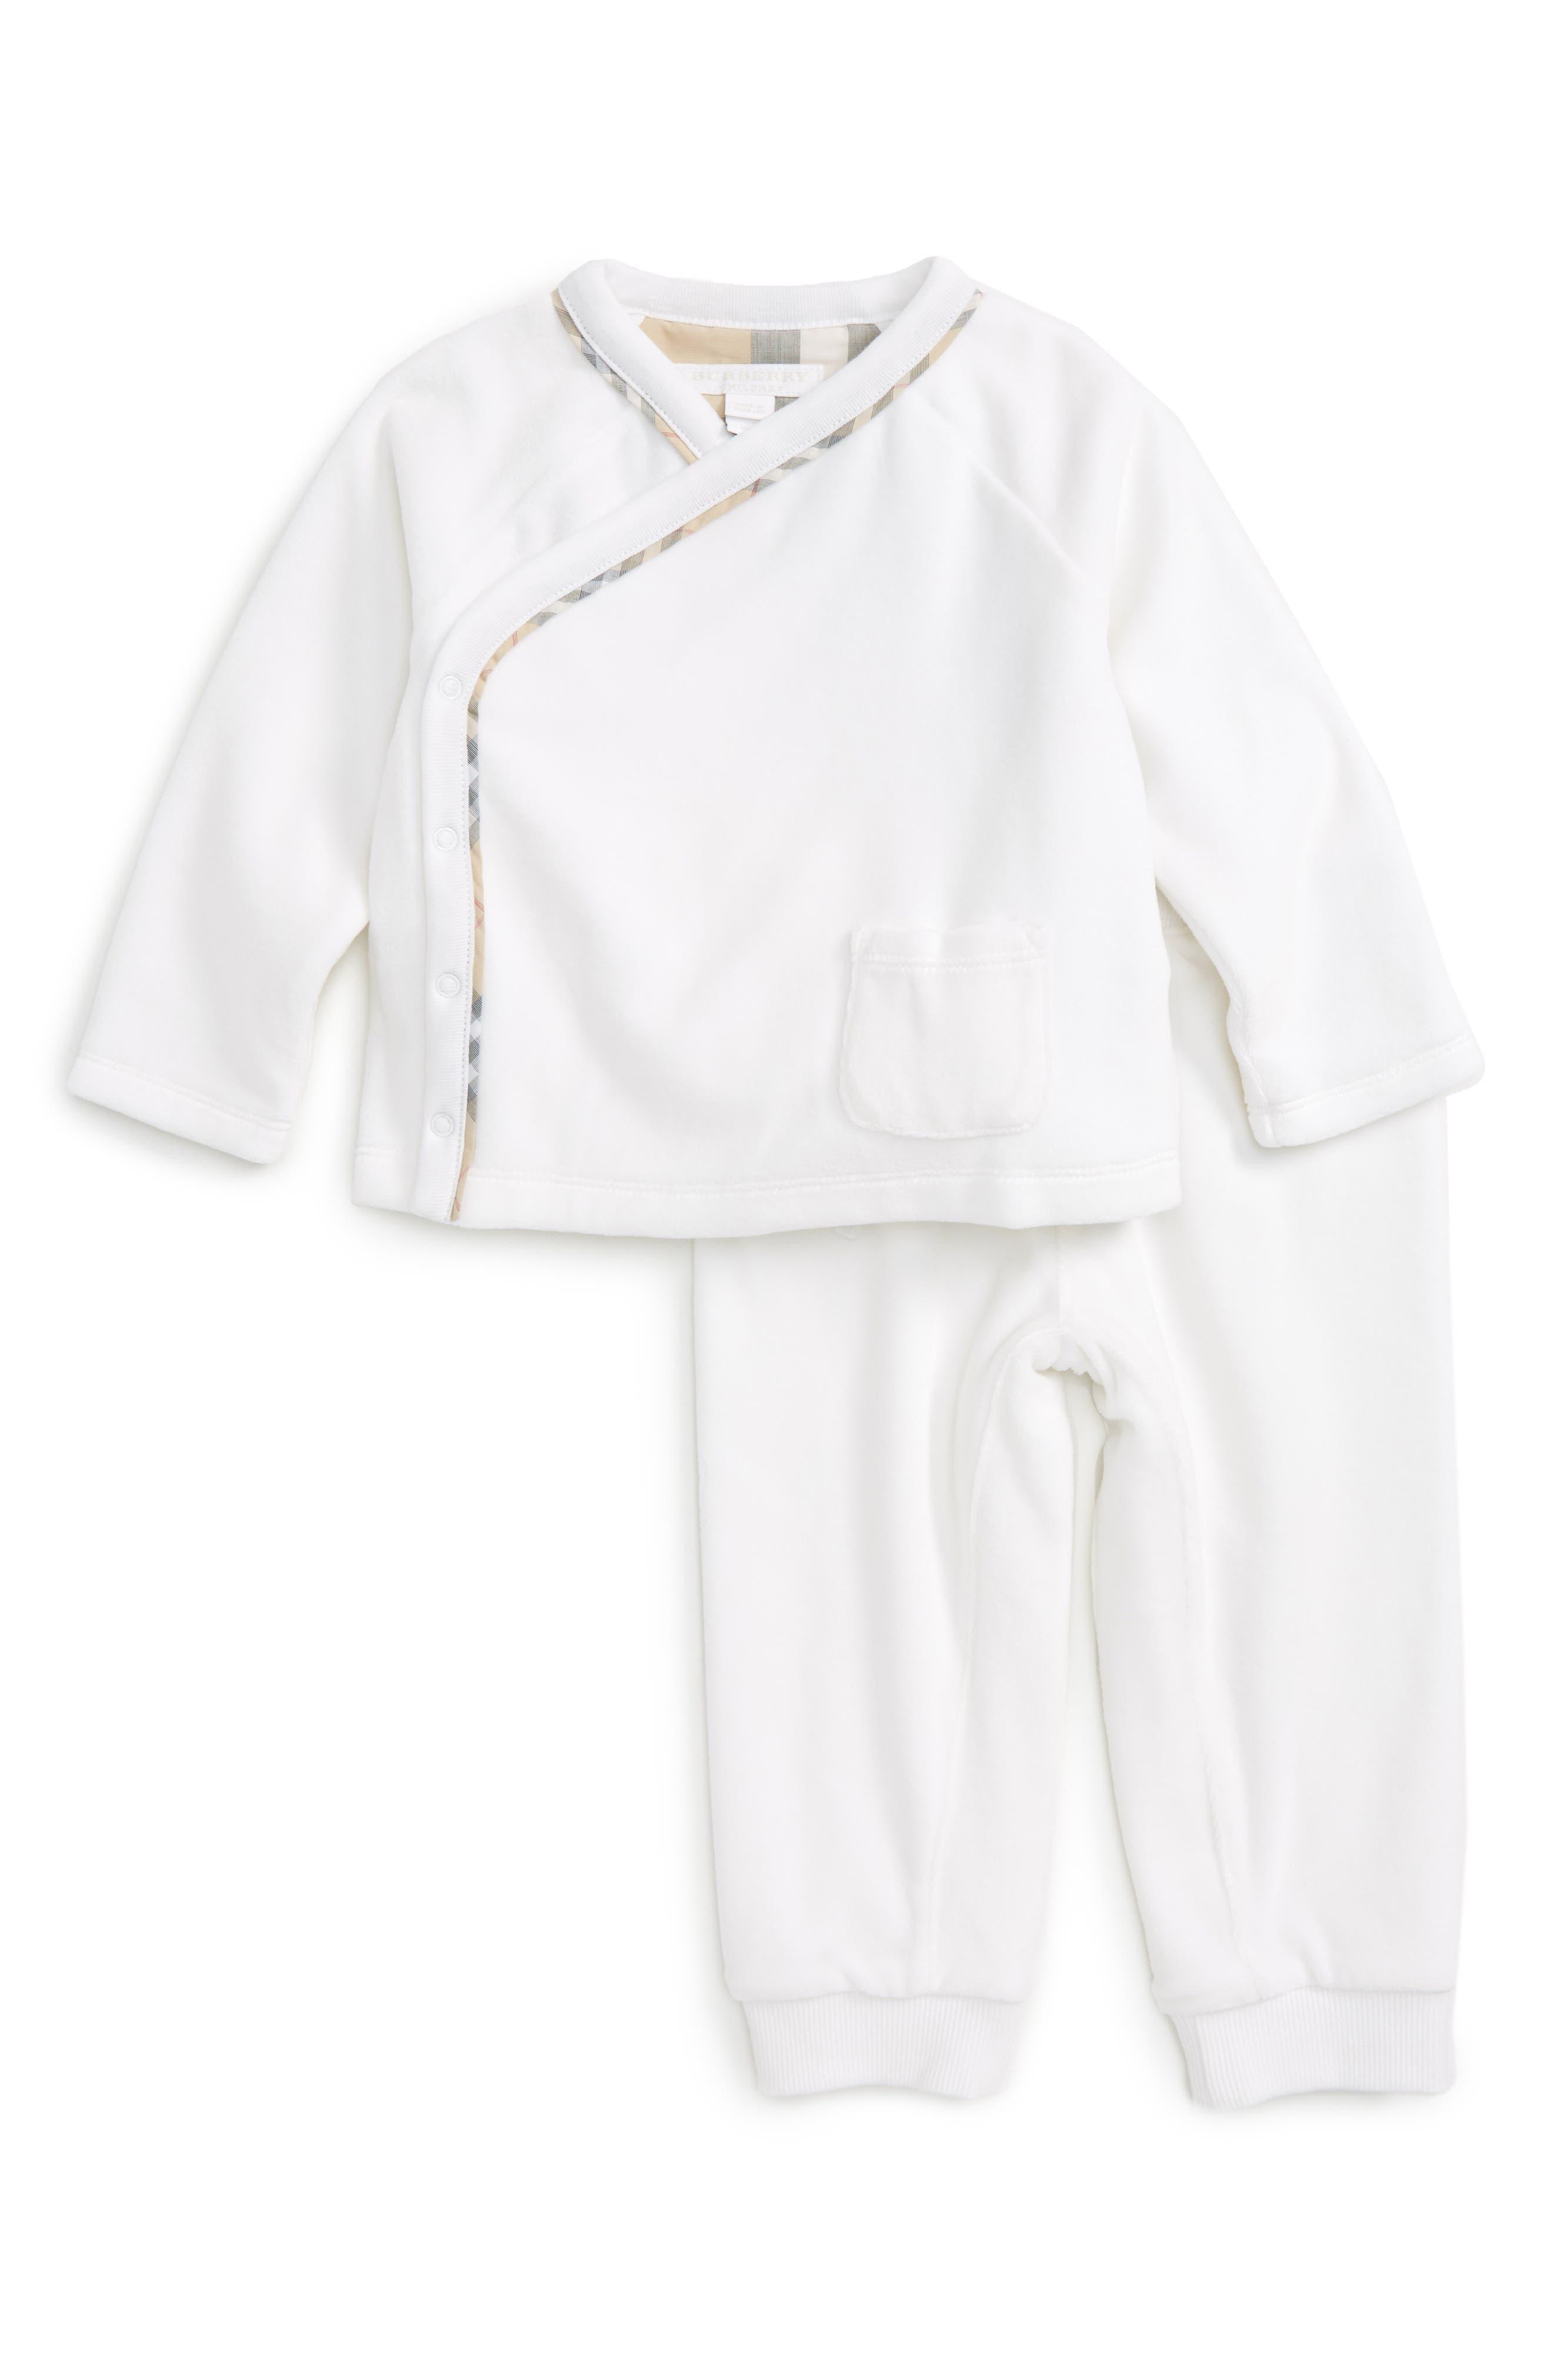 Main Image - Burberry Remy Shirt & Pants Set (Baby)